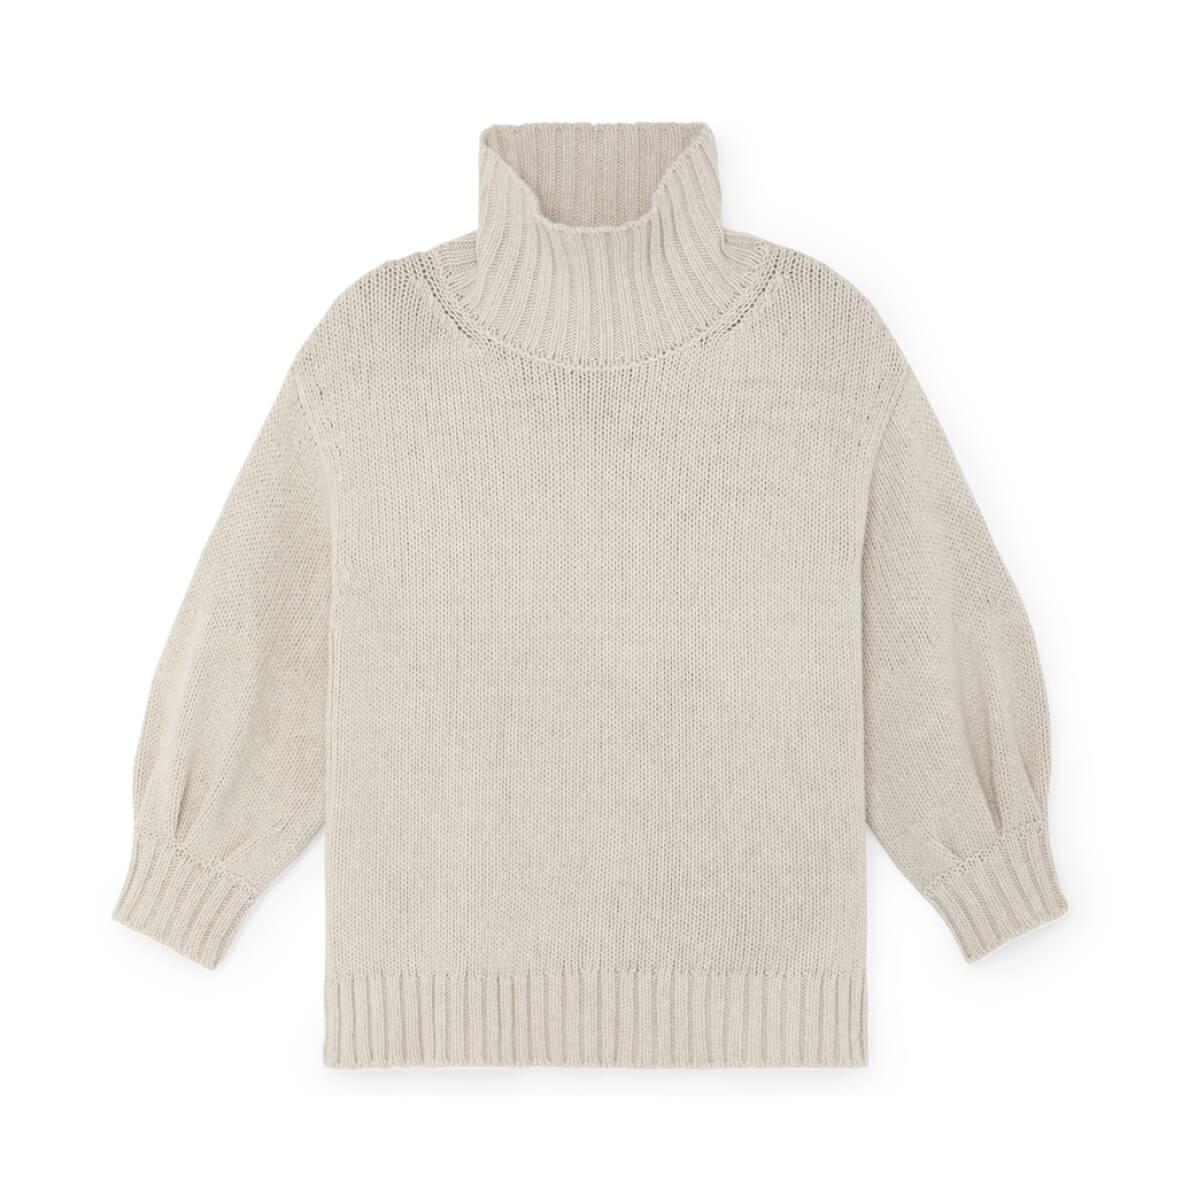 G.Label Evangelyn Puff-Sleeve Sweater